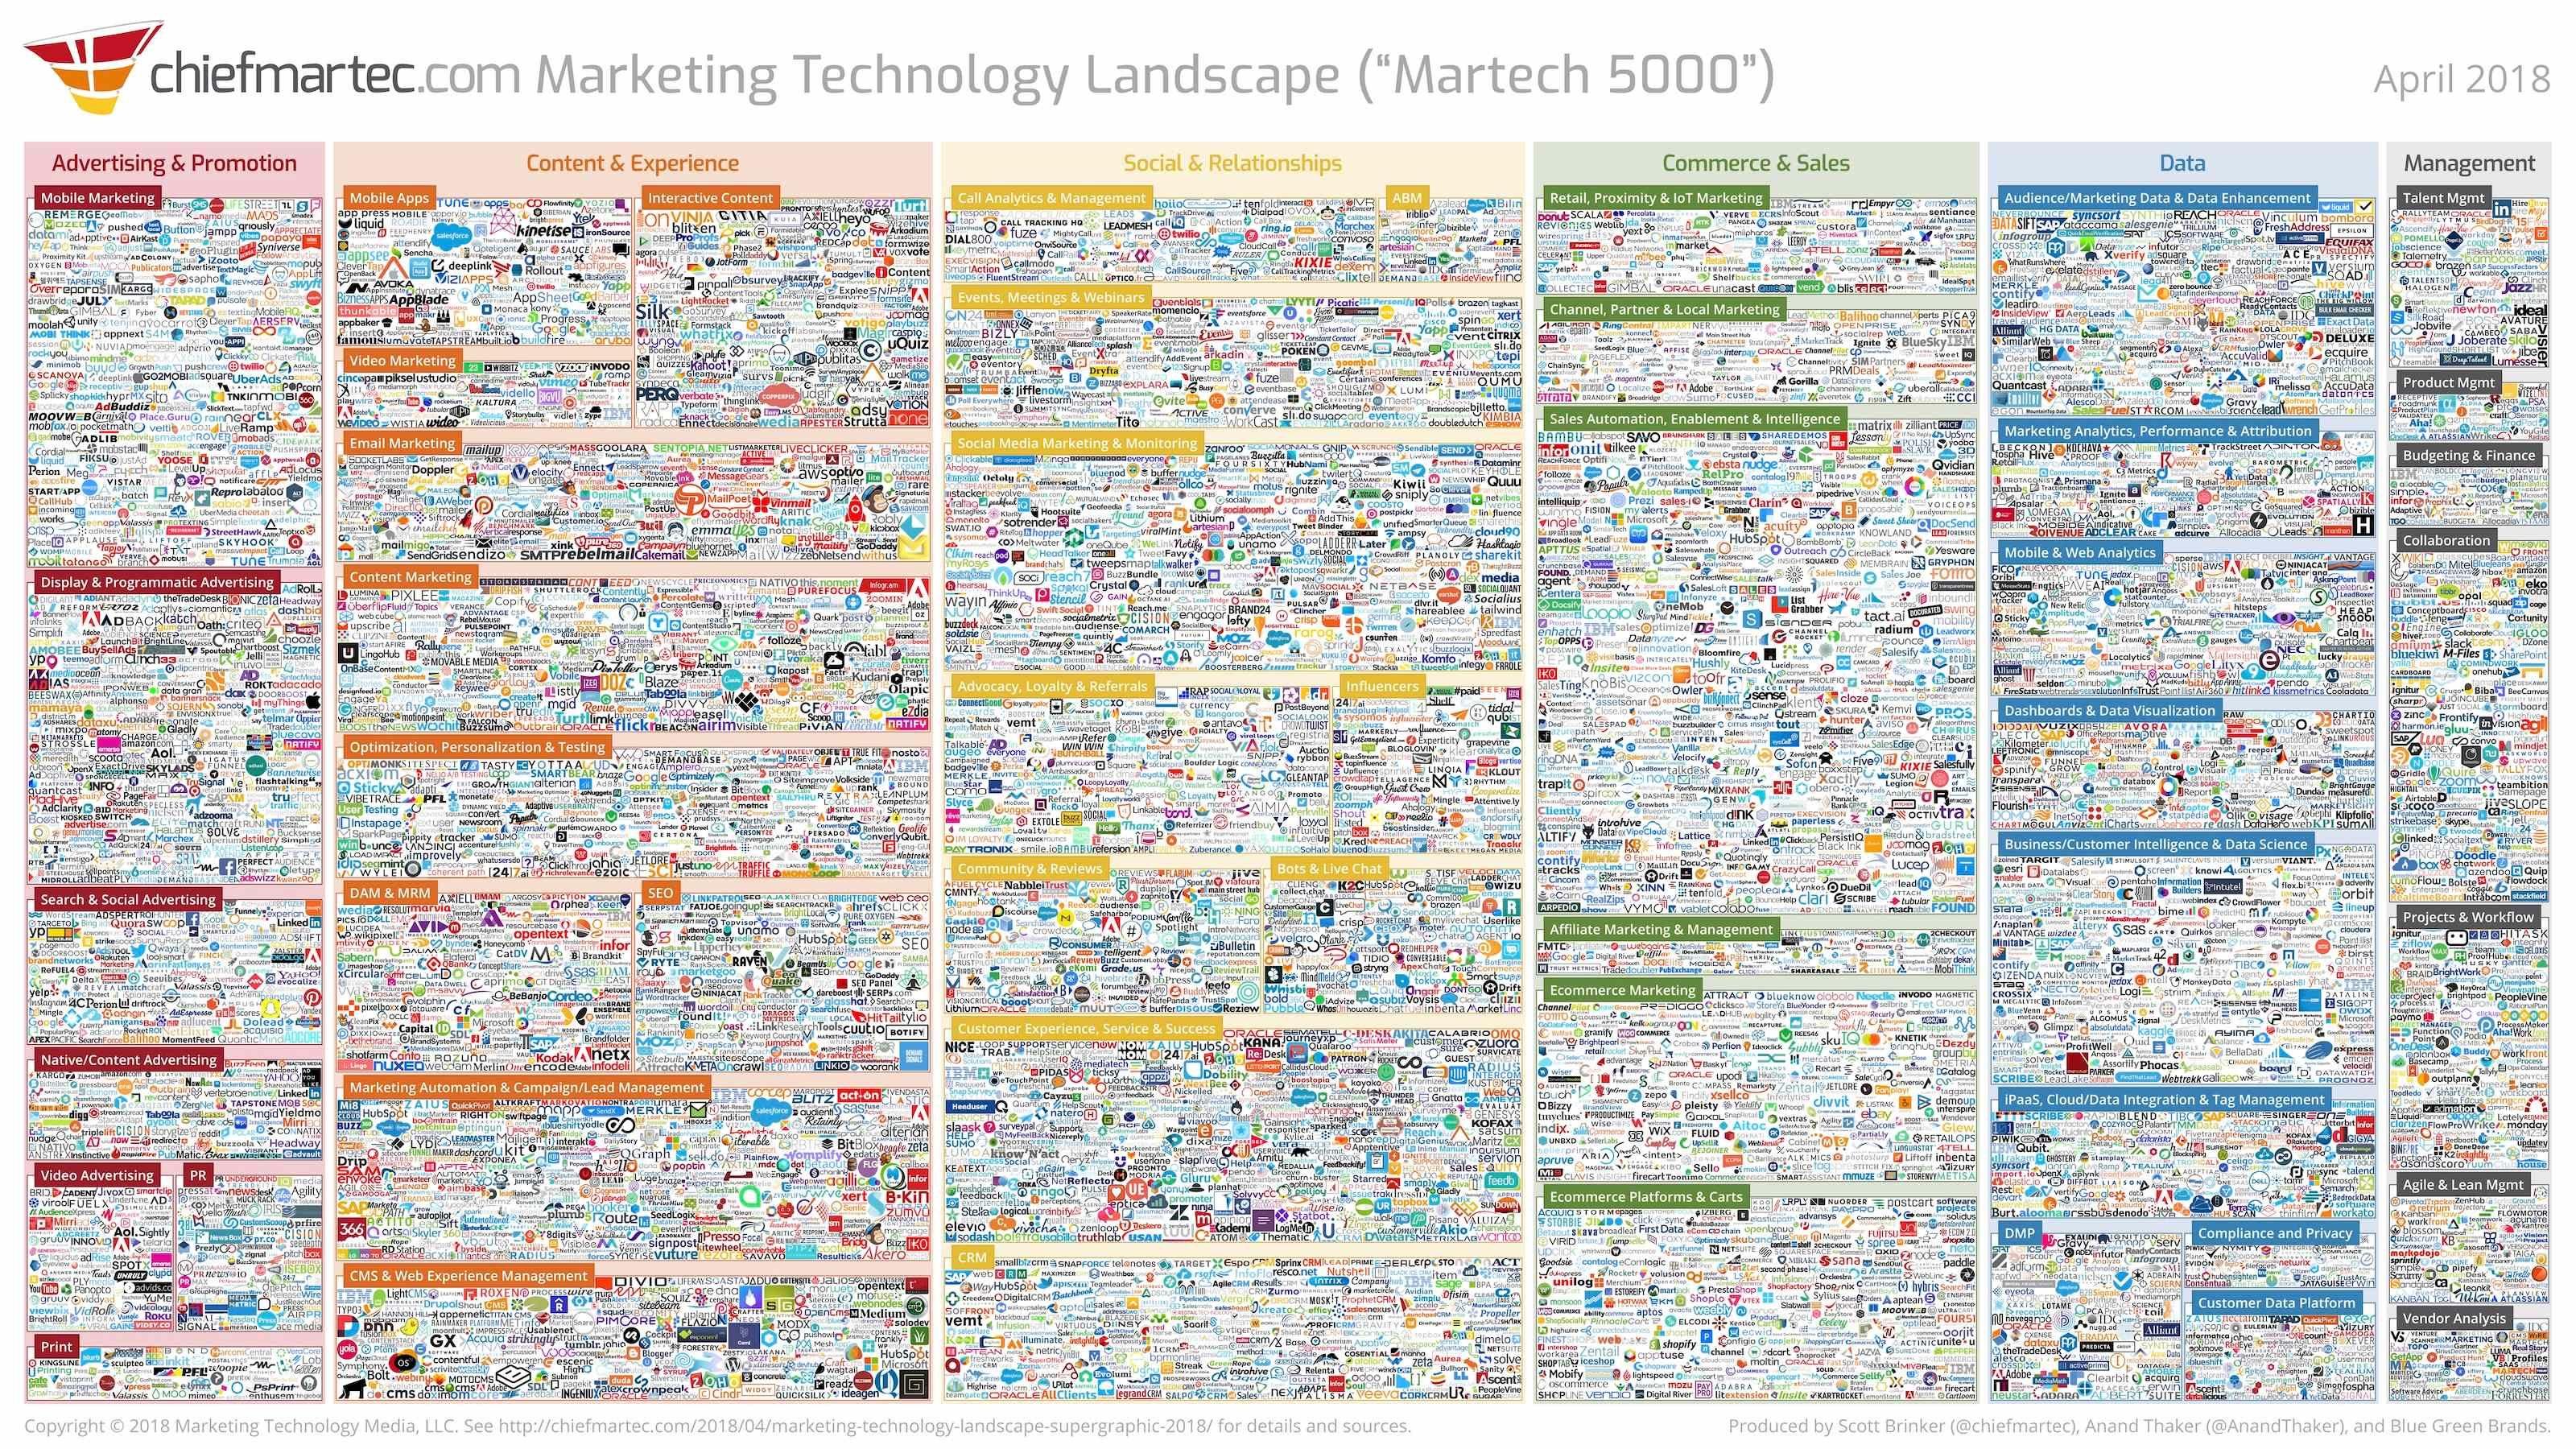 Saas companies: Martech 5000